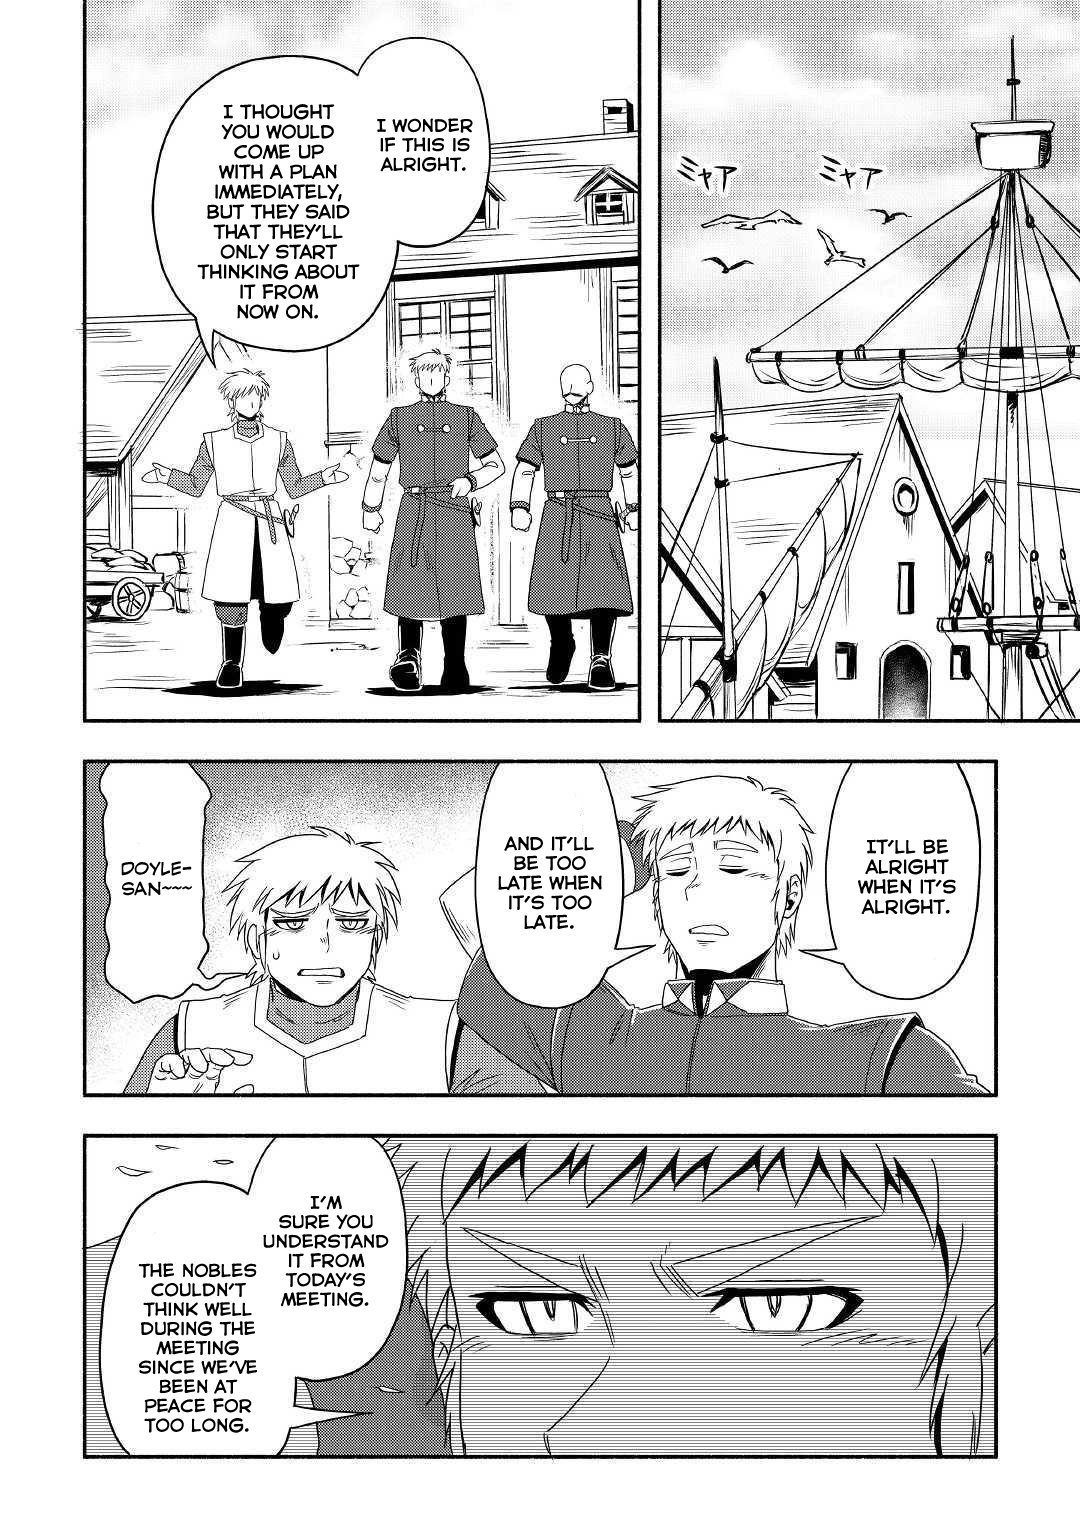 Manga Isekai ni Tobasareta Ossan wa Doko e Iku? - Chapter 26 Page 19